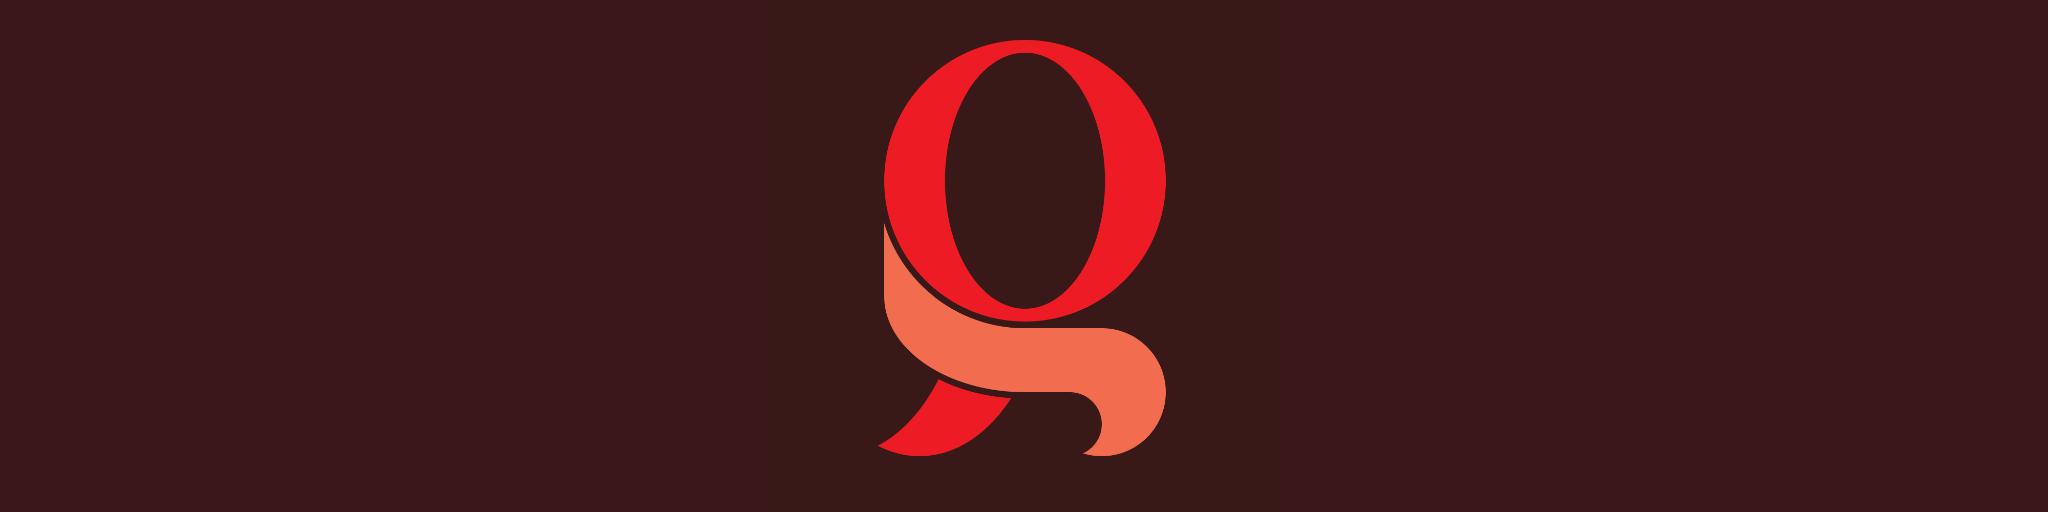 Ruota Logo